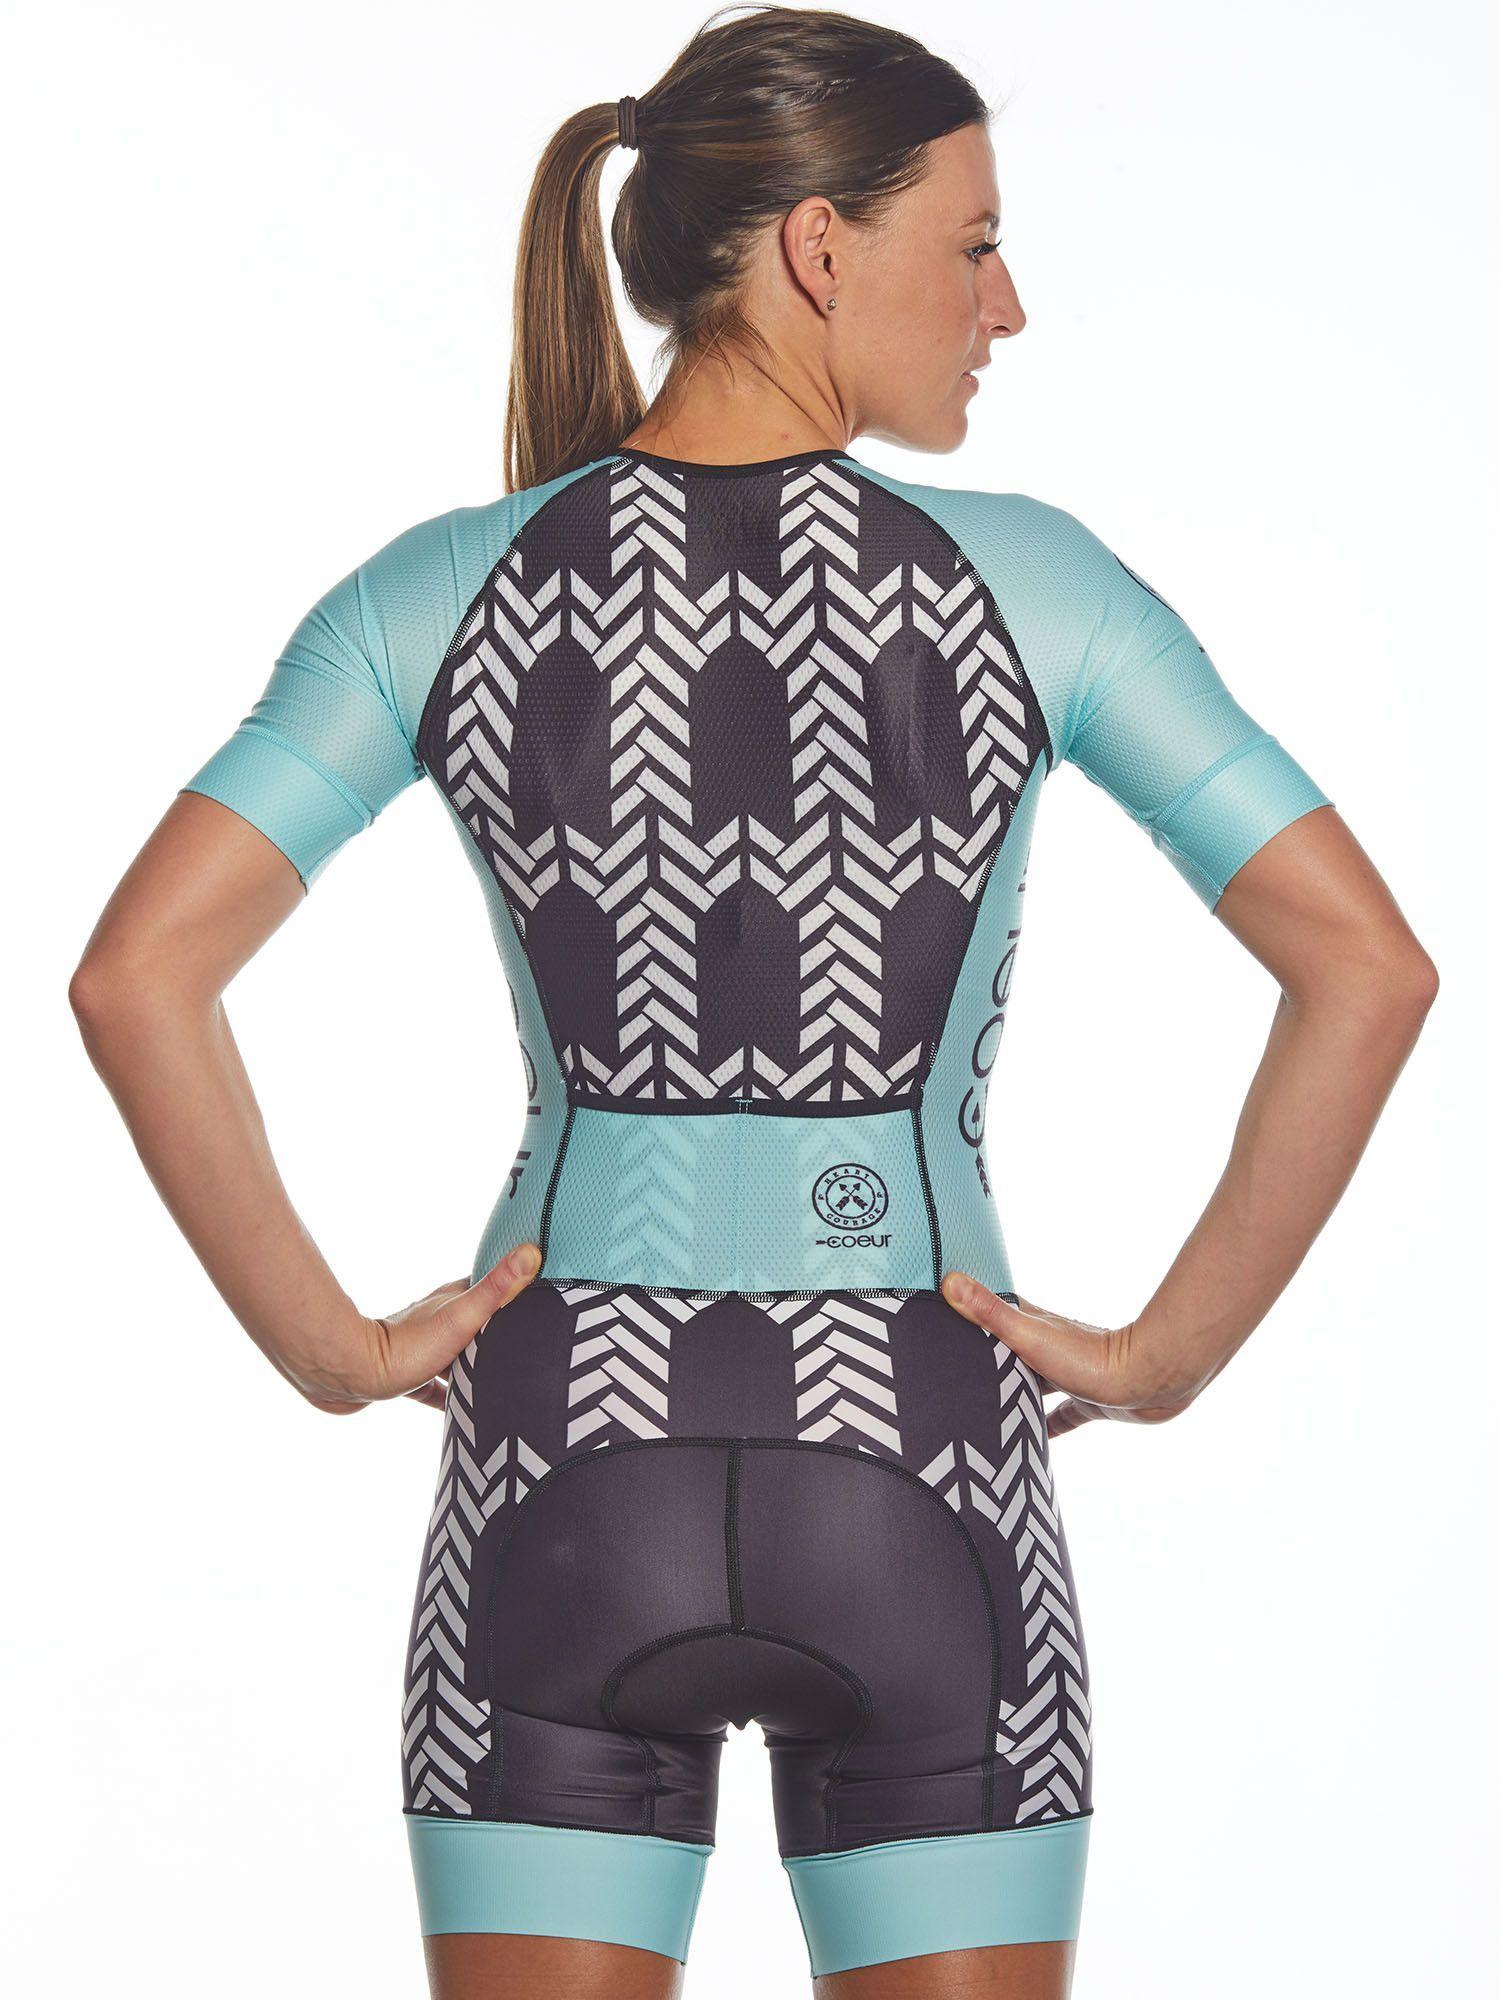 Women's Sleeved One Piece Triathlon Suit - Blue Arrow